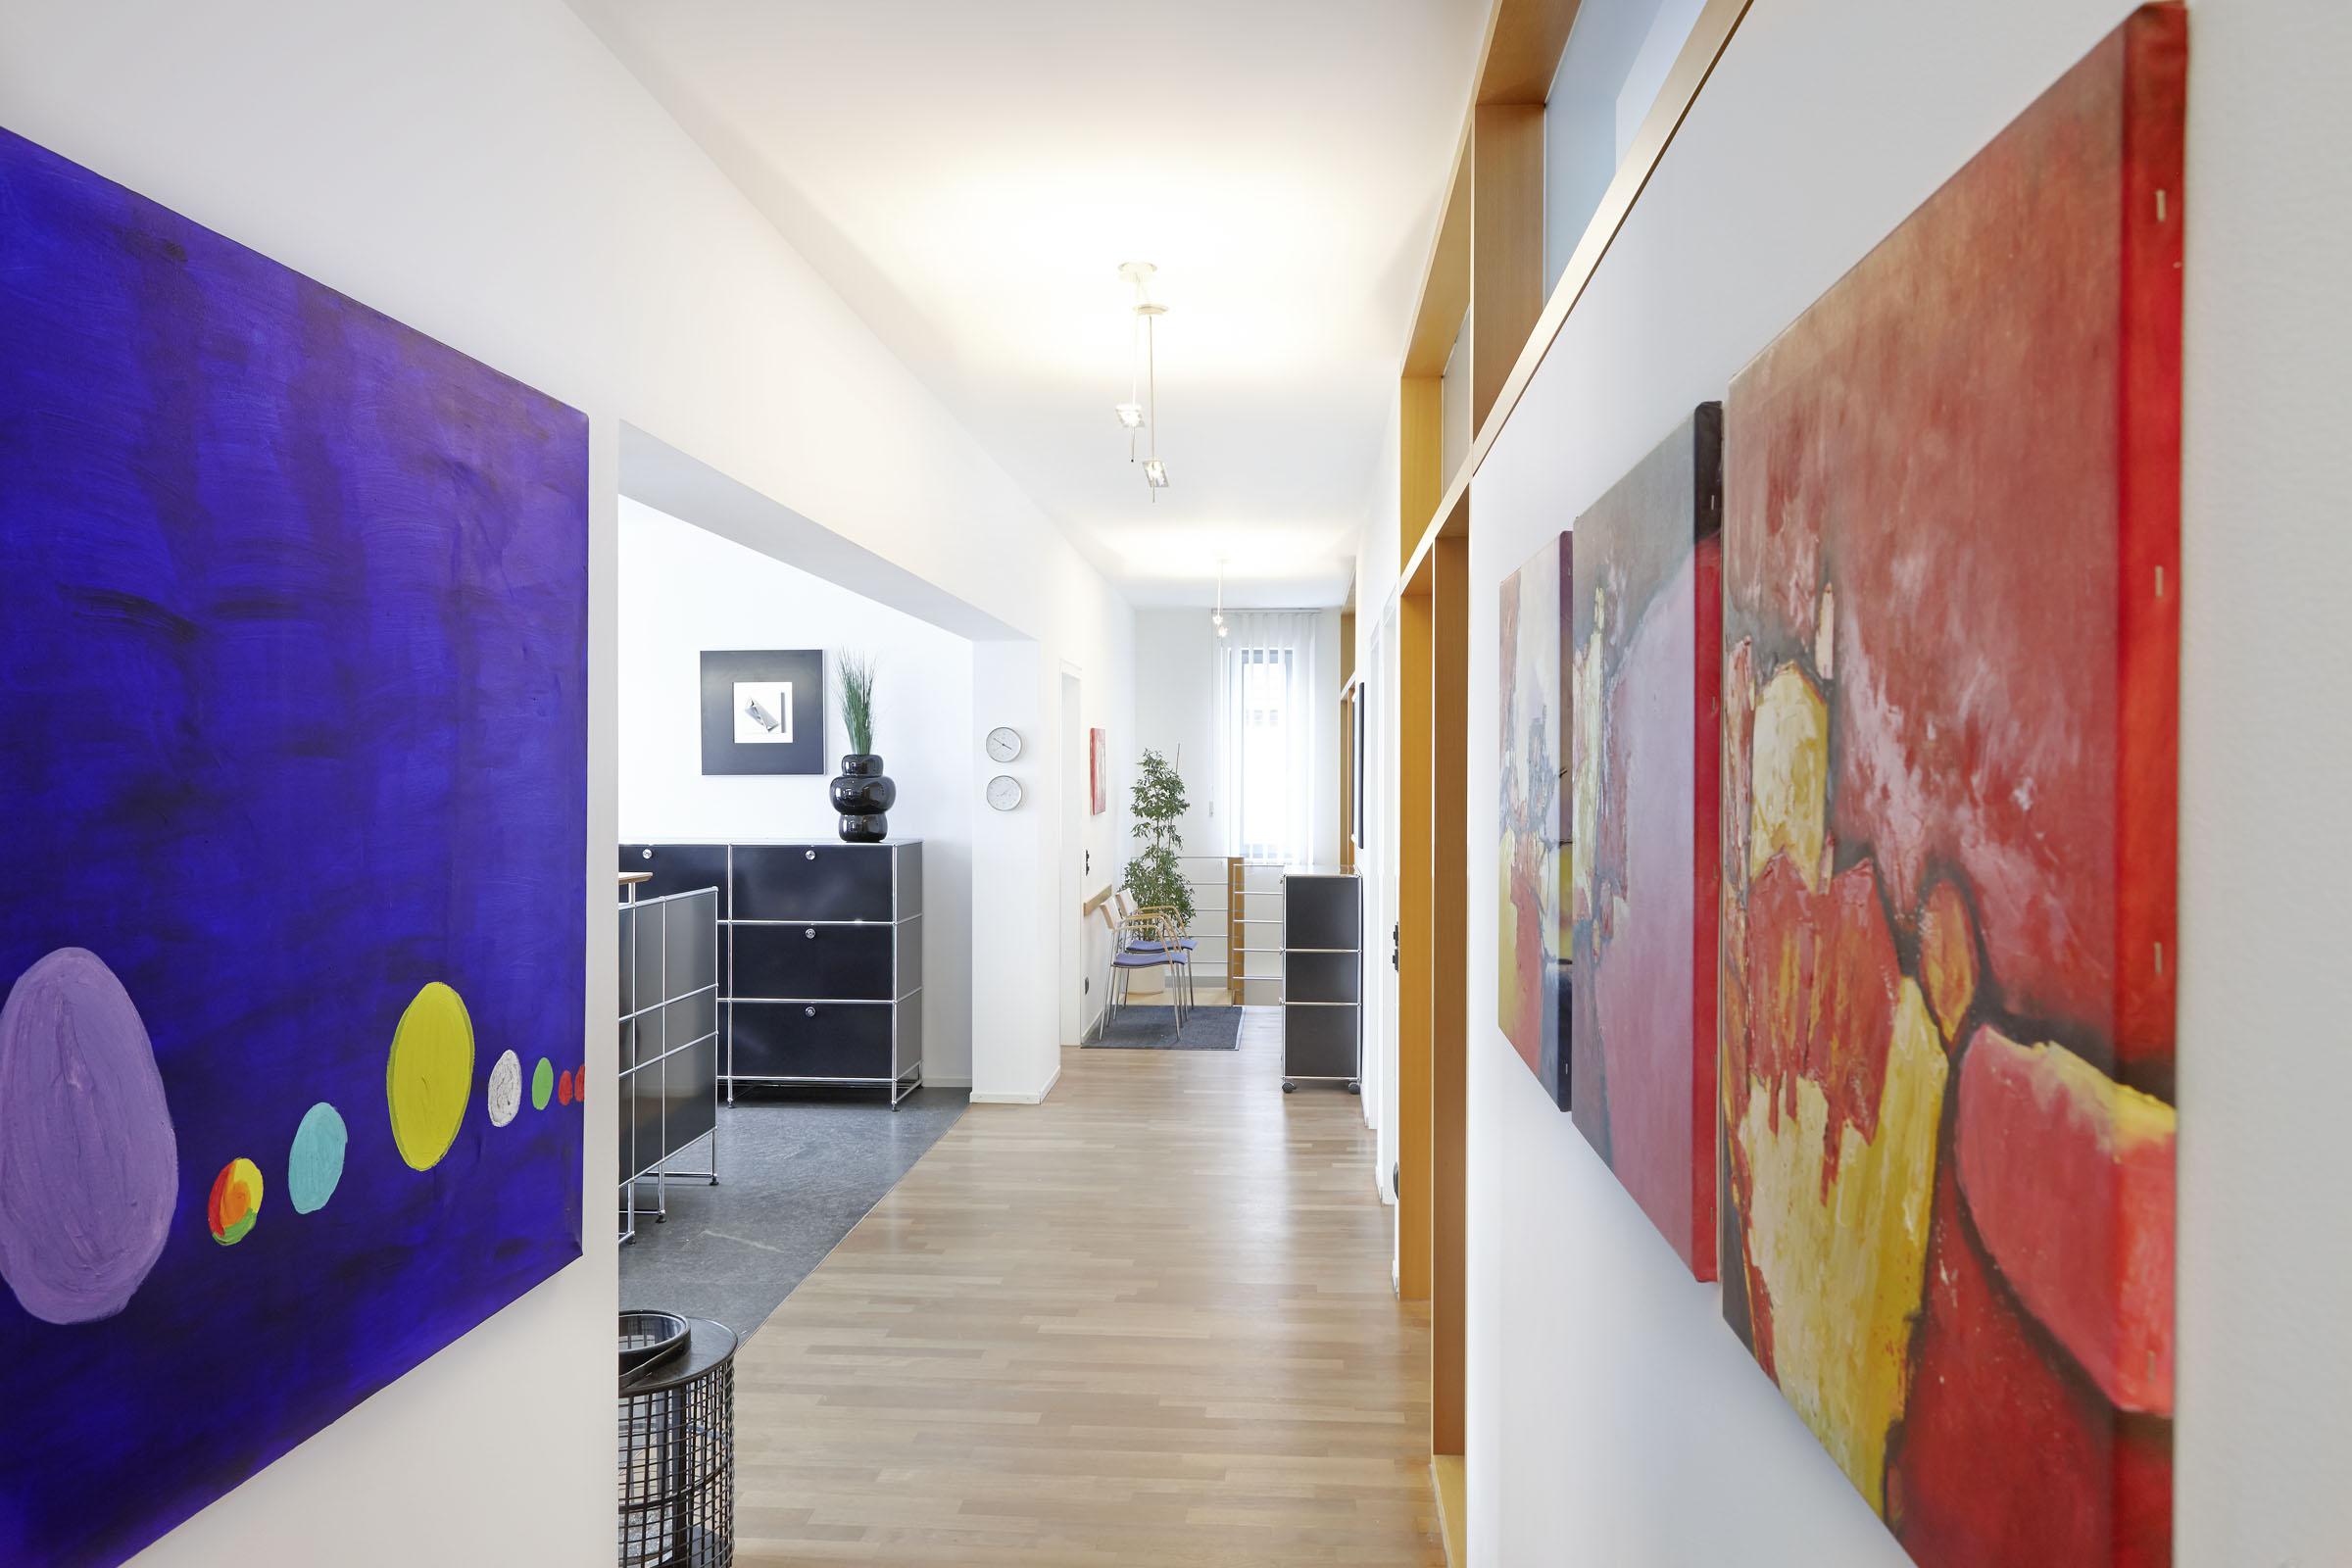 praxisrundgang villingen schwenningen allgemeinmedizin hausarzt internist arzt experte. Black Bedroom Furniture Sets. Home Design Ideas